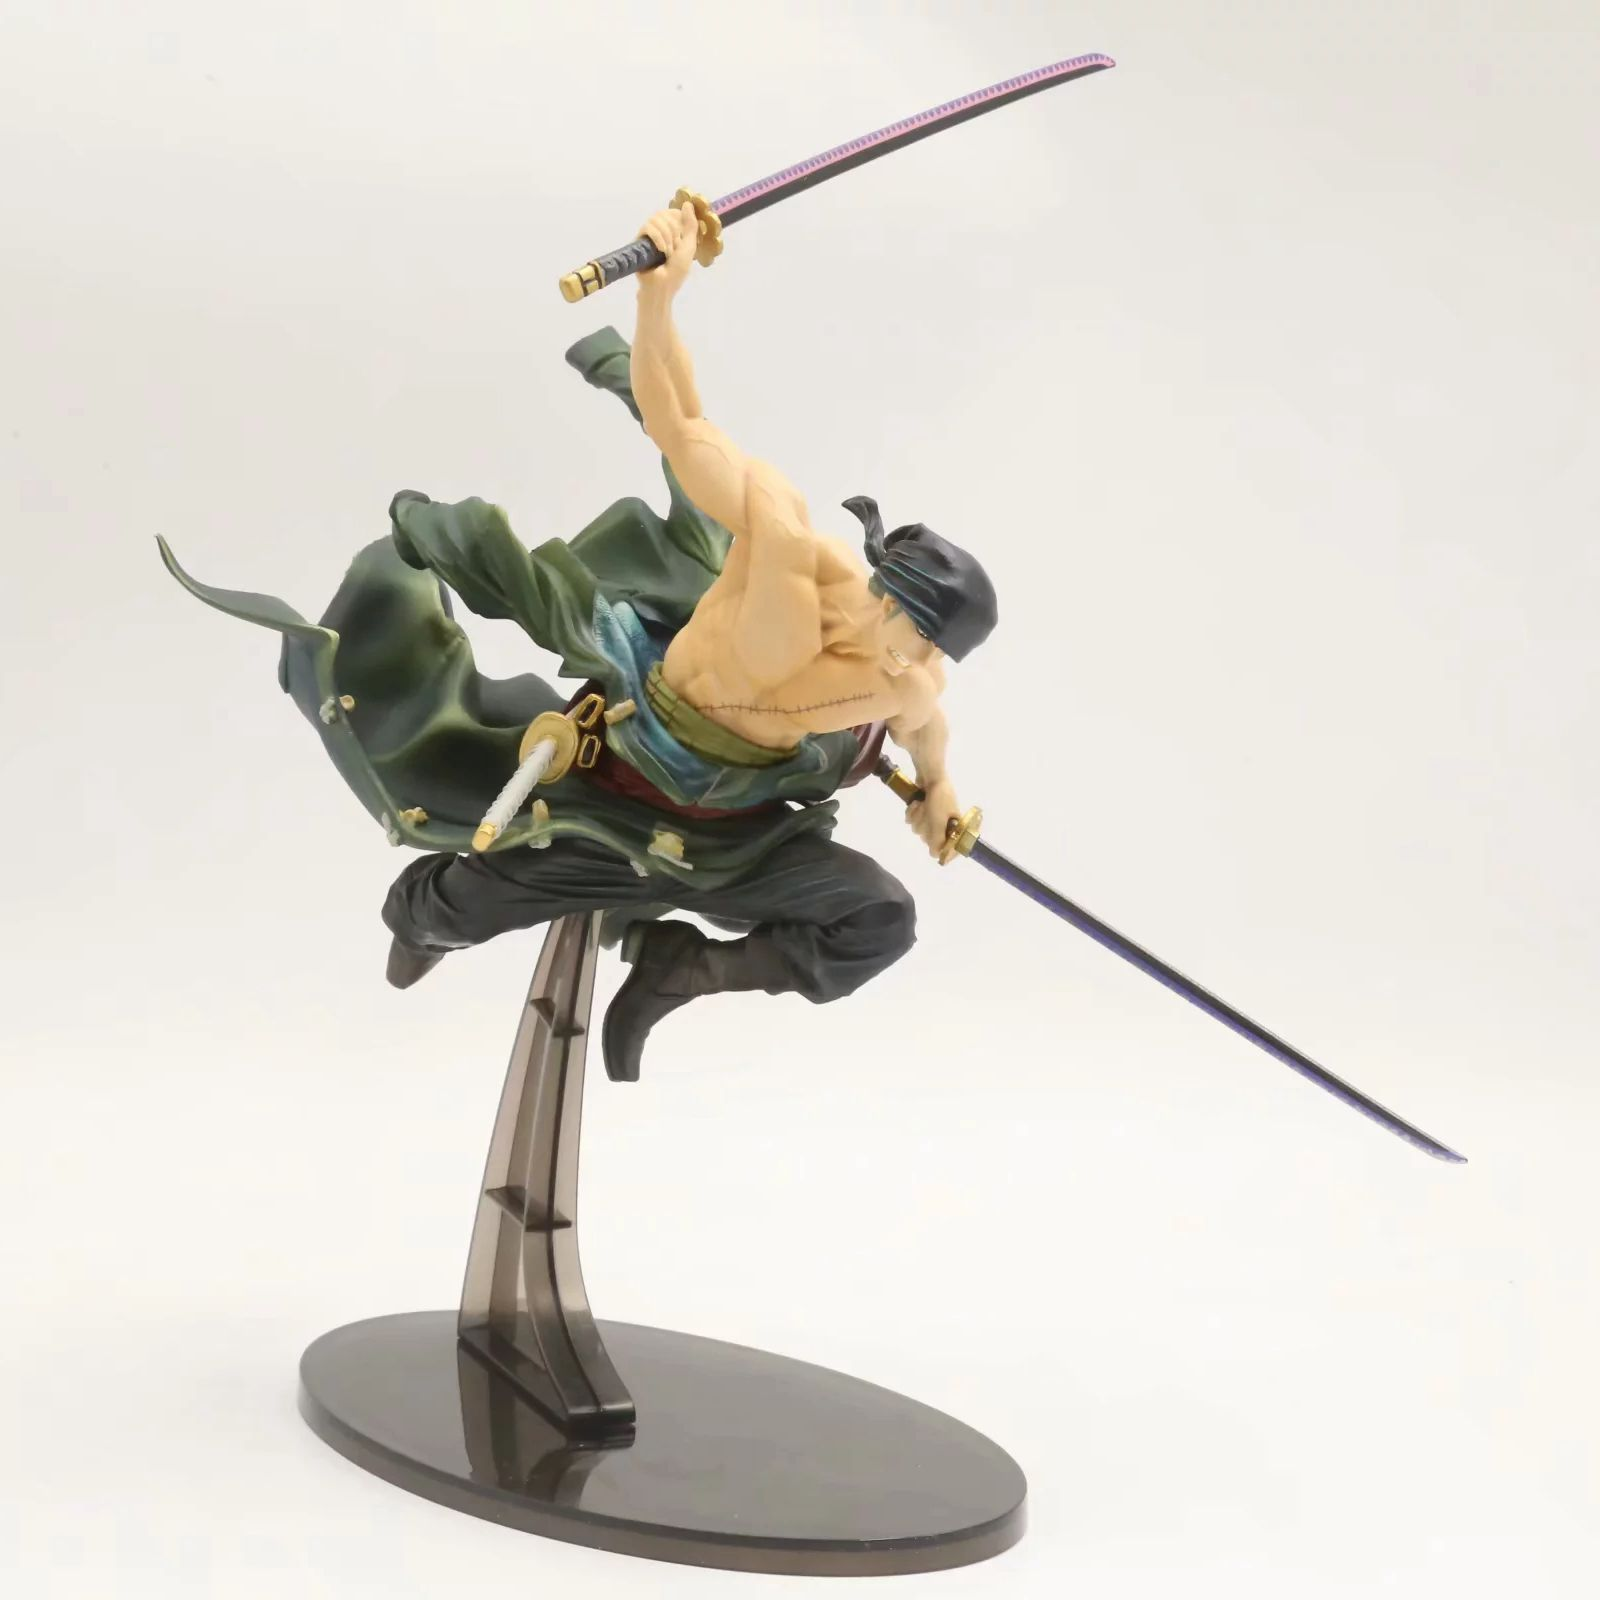 Anime One Piece 26cm BWFC Champion Roronoa Zoro Action Figure Collection Model Toys